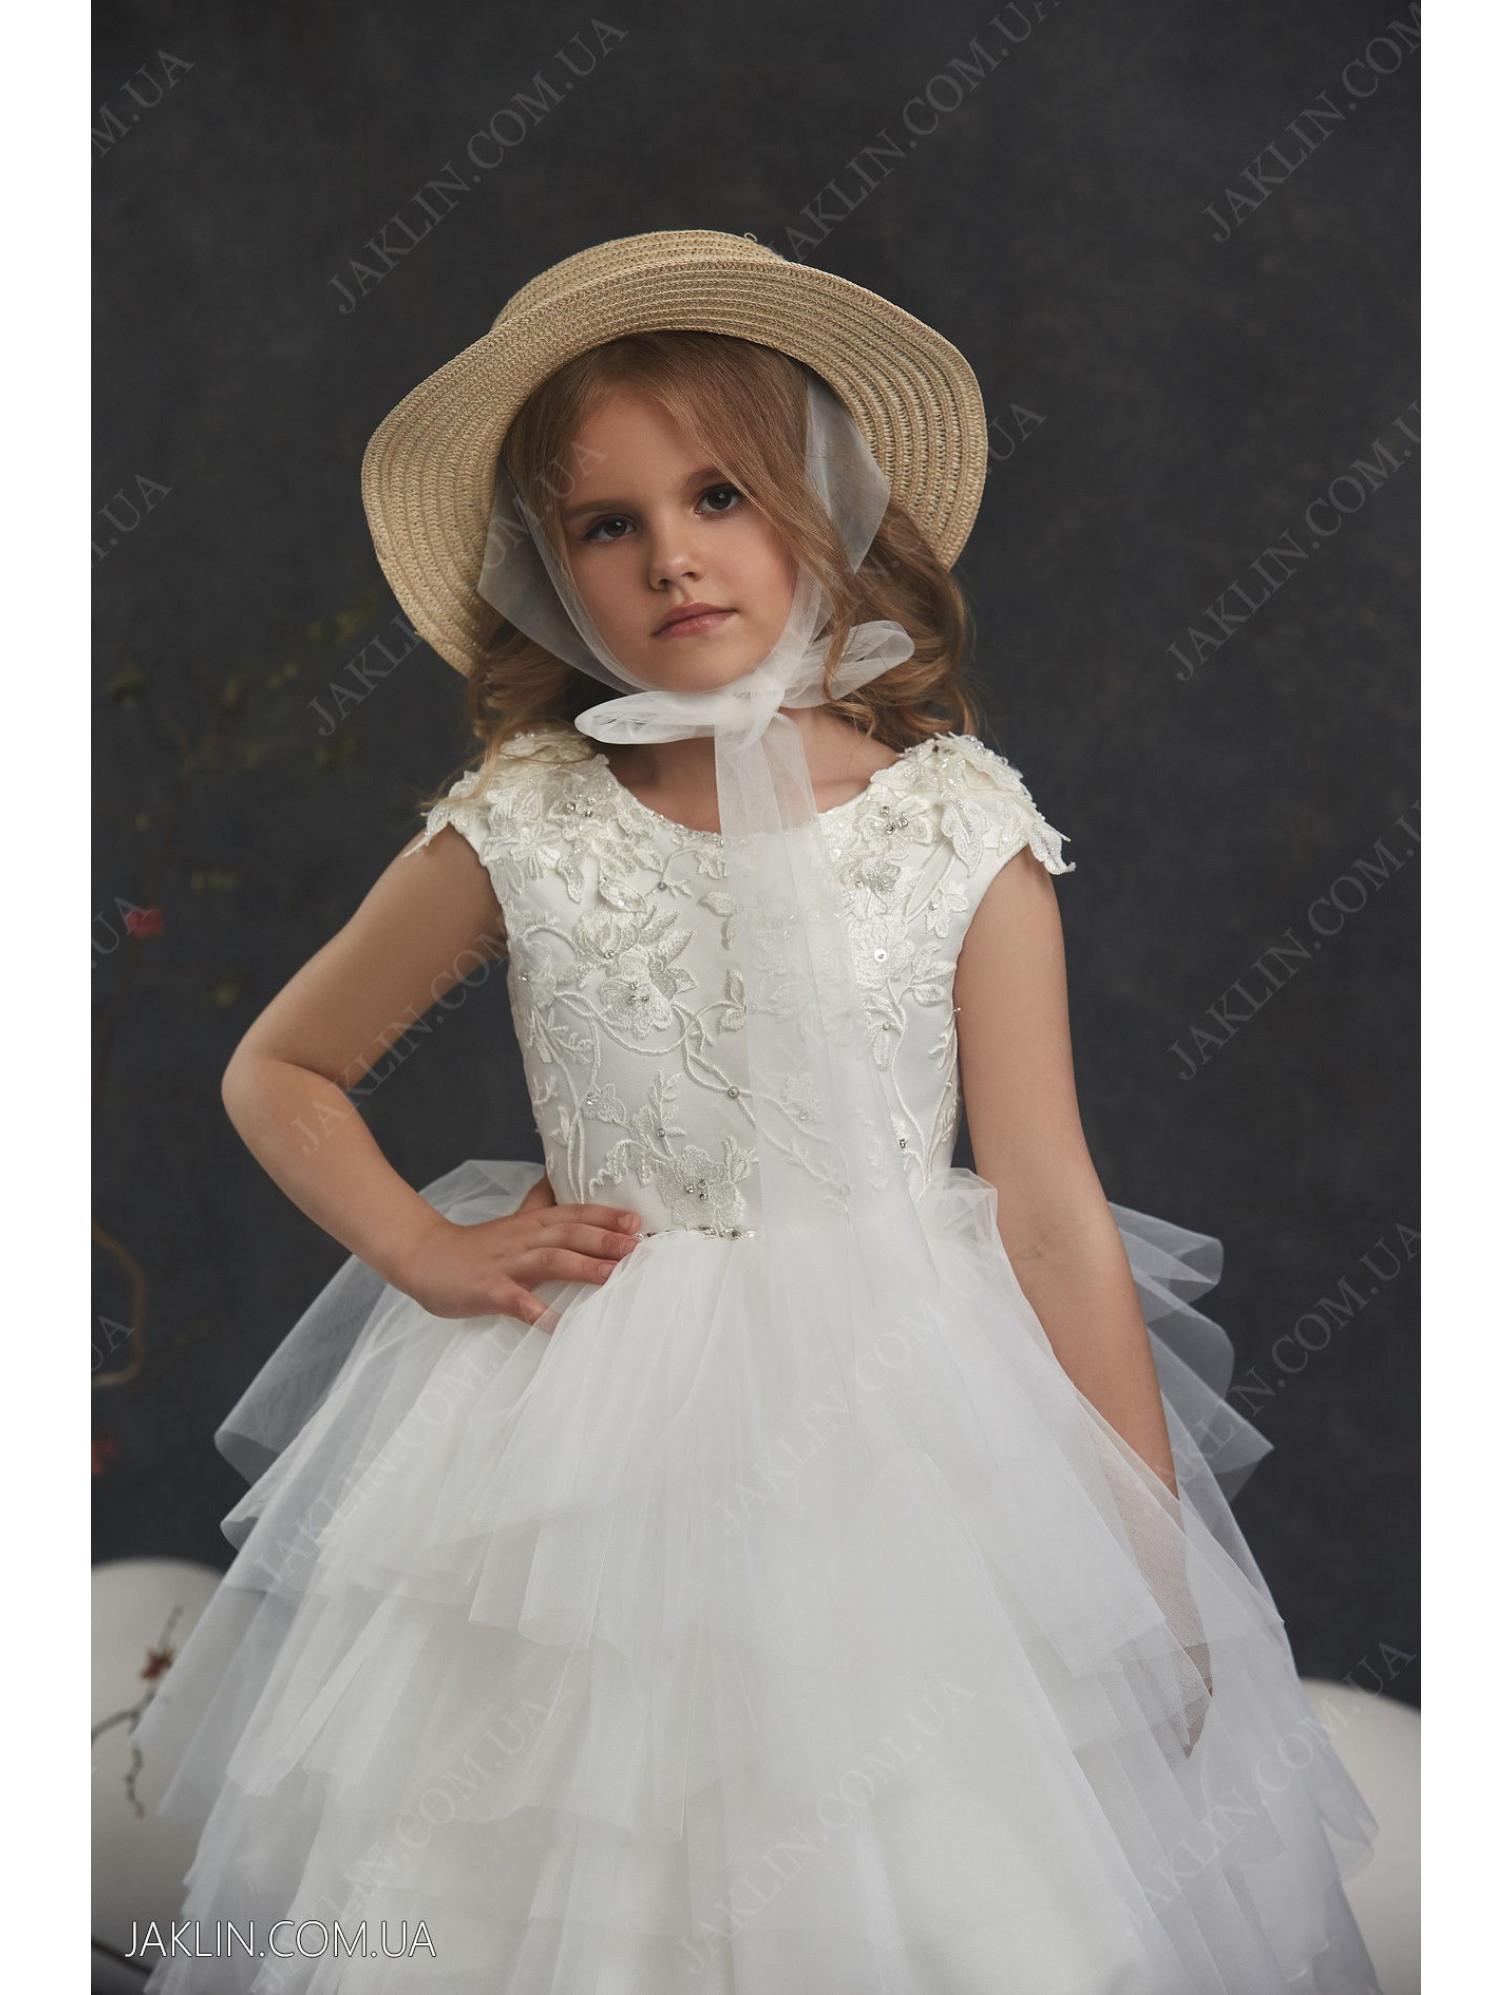 Child dress 3037